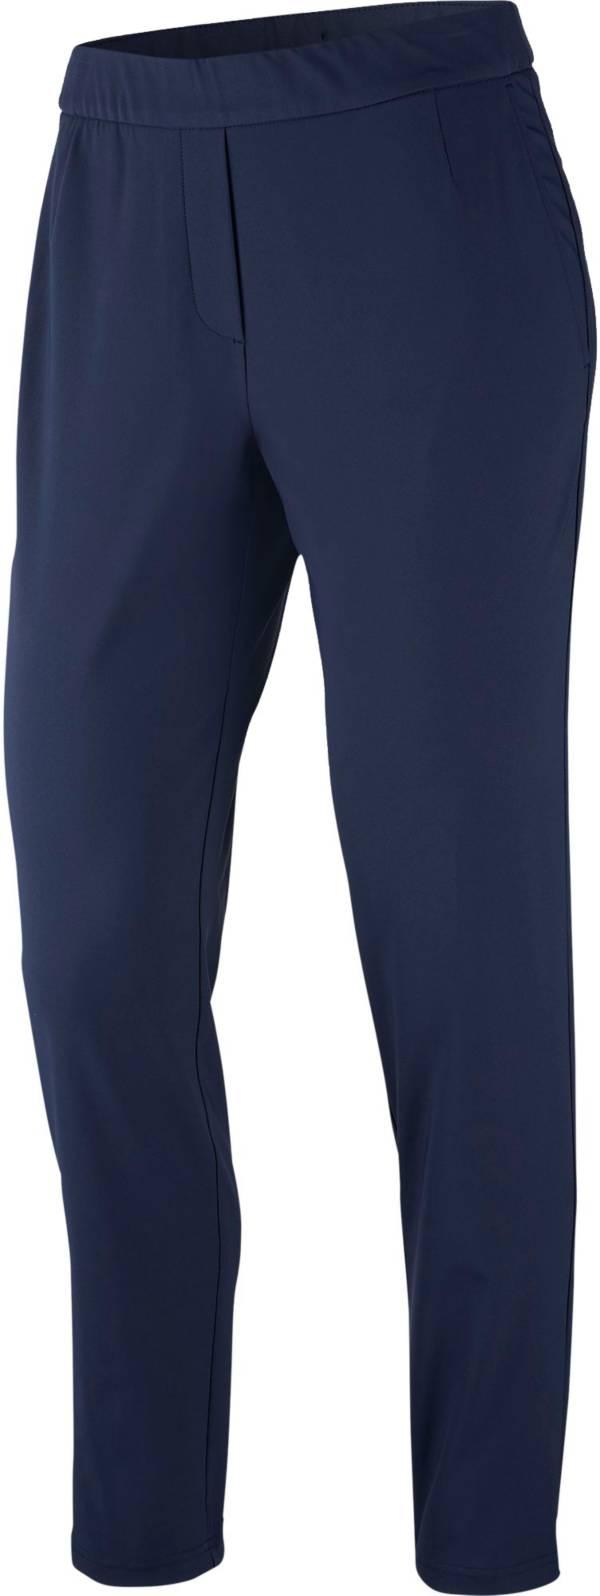 Nike Women's Flex UV Victory Golf Pants product image